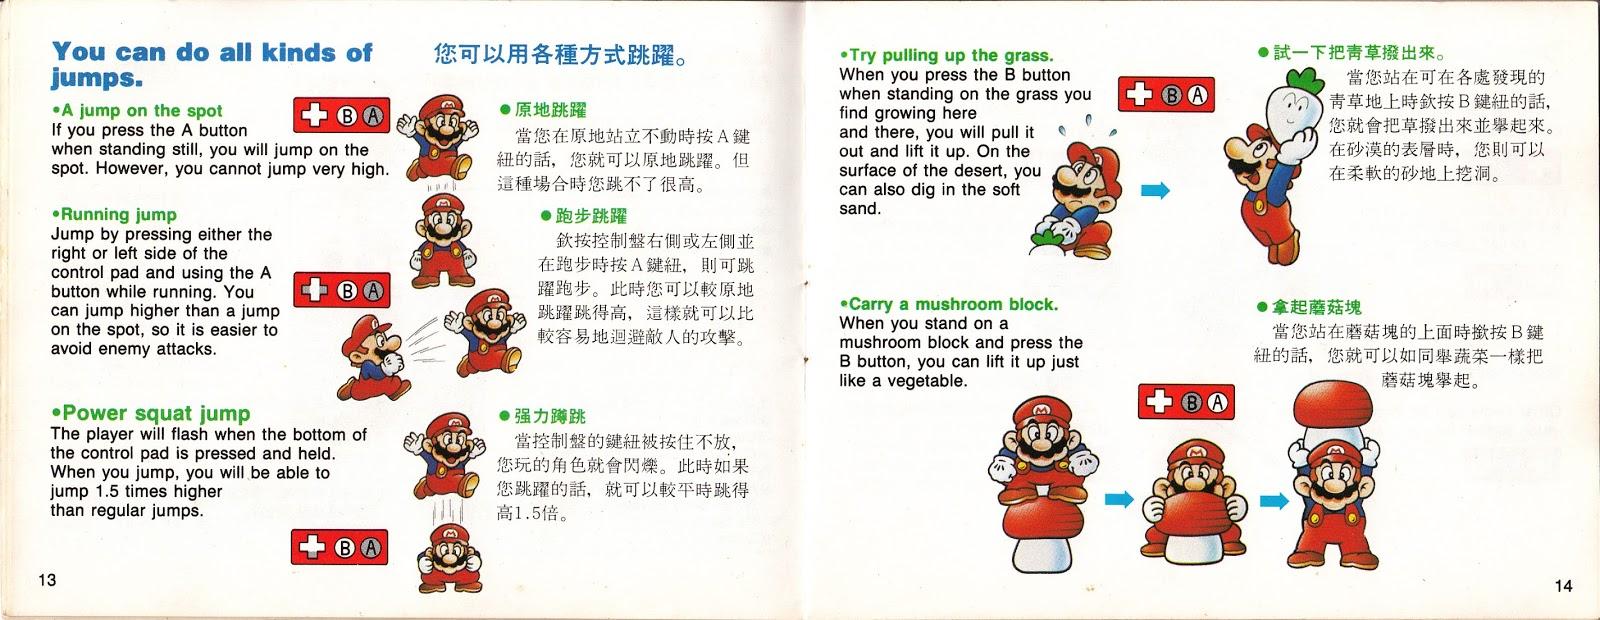 somerussianmariodude nes game manuals 1 super mario bros 2 nes rh somerussianmariodude blogspot com super mario bros 3 instruction booklet Super Mario World Booklet